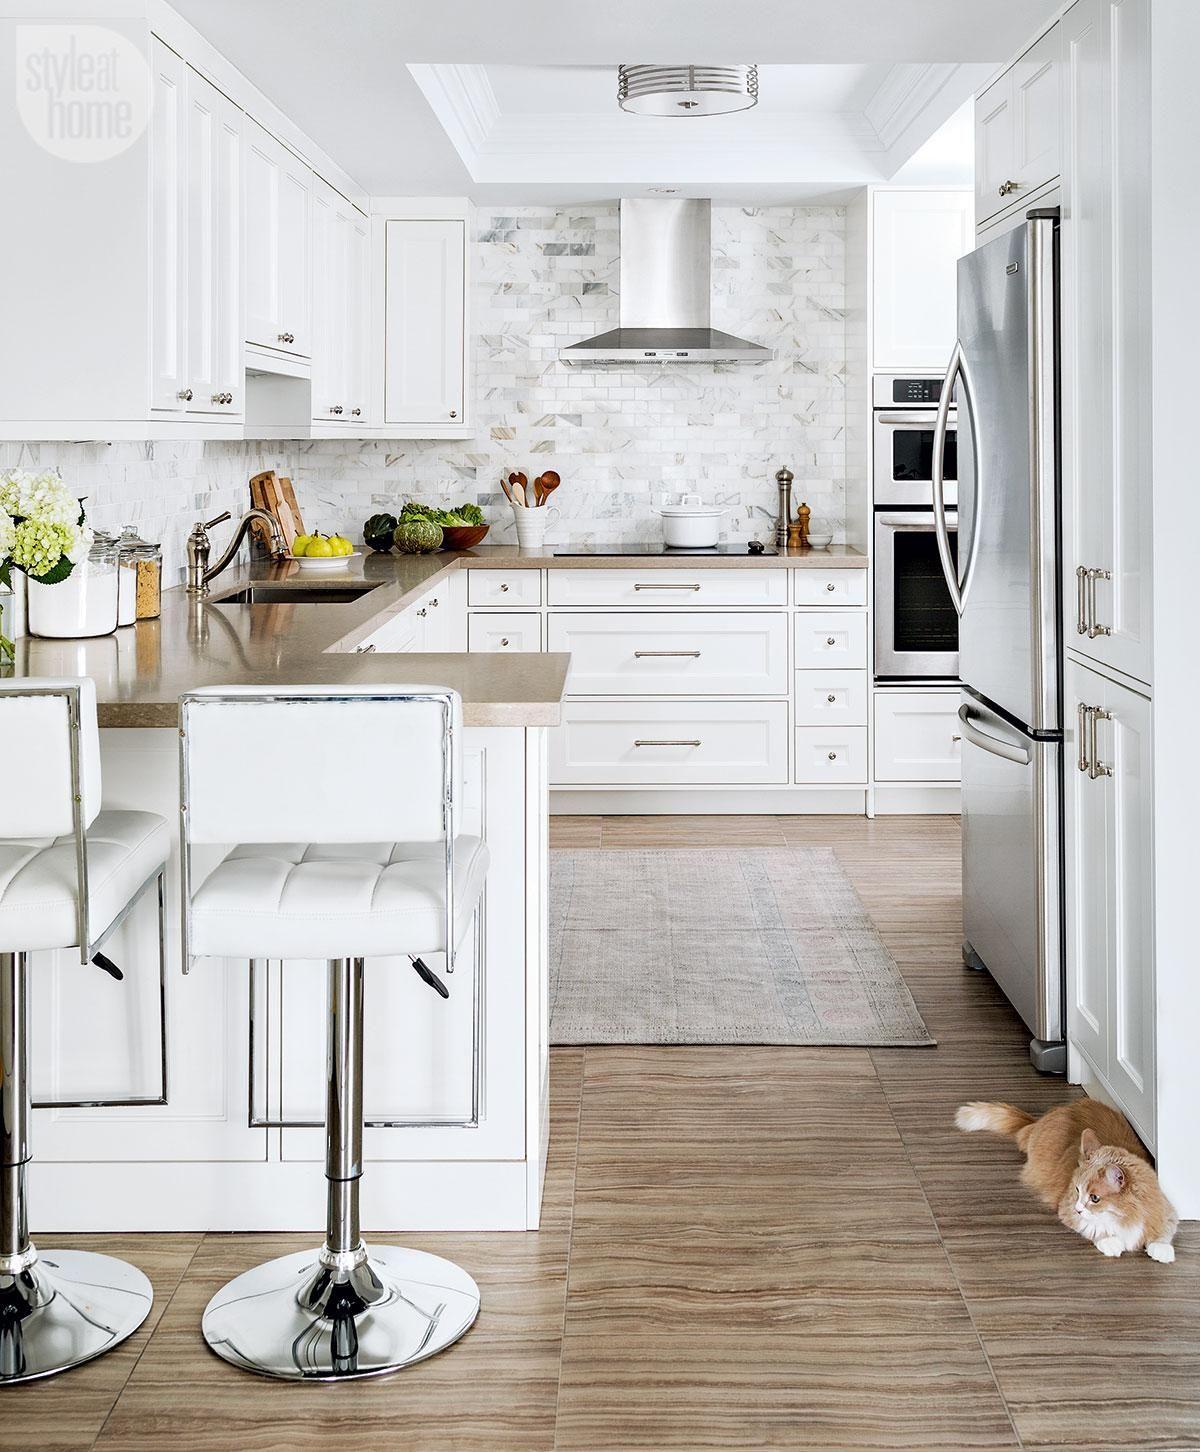 Condo Kitchen Renovation Ideas: Kitchen Renovation: Functional And Contemporary